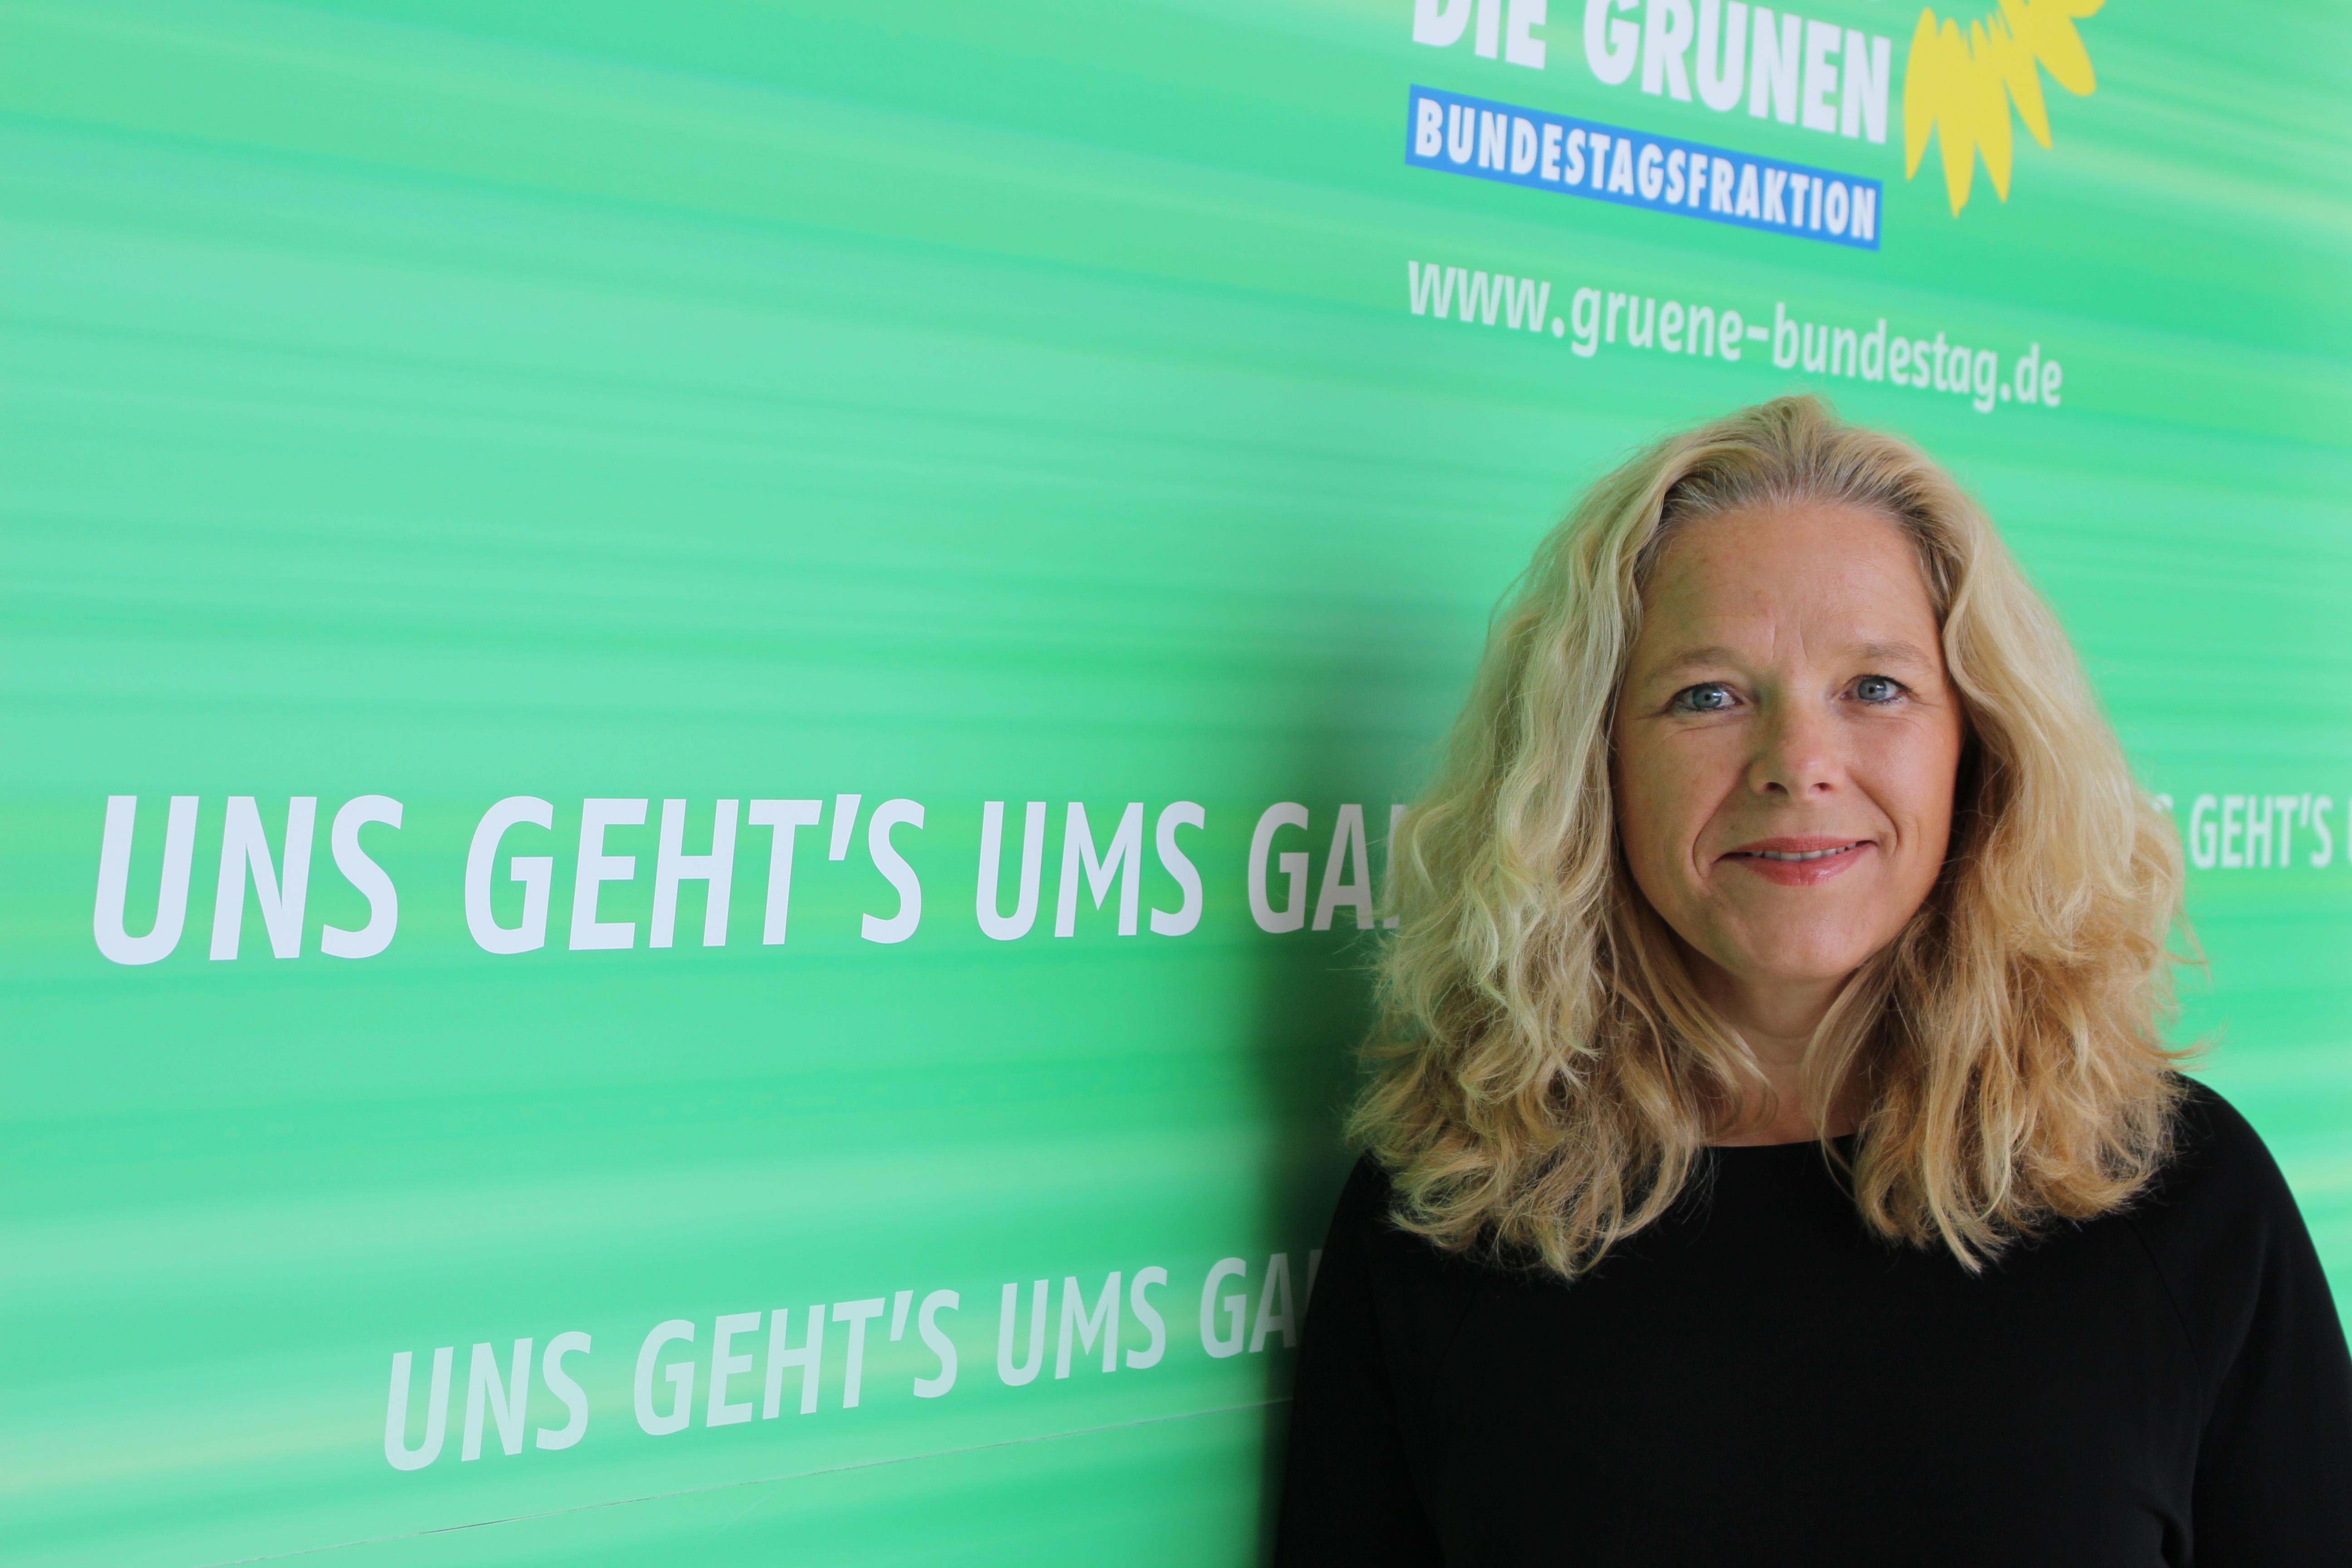 150911 PM Minderheitenrechte Familienausschuss Bundestag Doris Wagner Anhörung